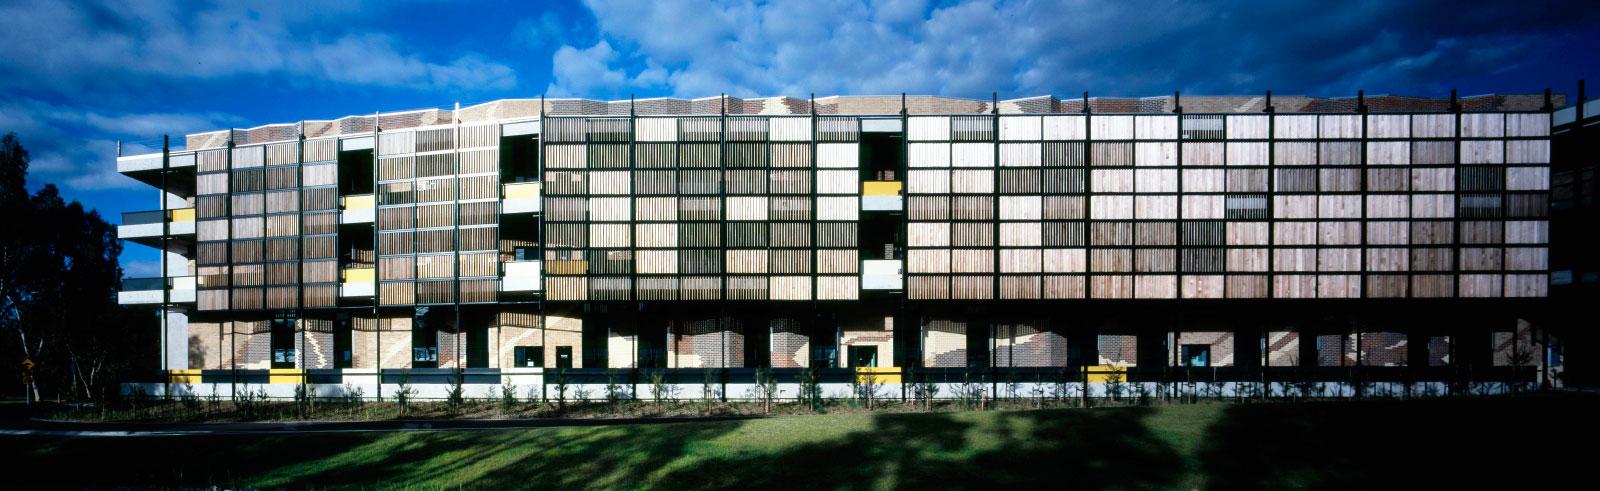 H2o-Architects-Melbourne-Deakin-University-Central-Precint-02